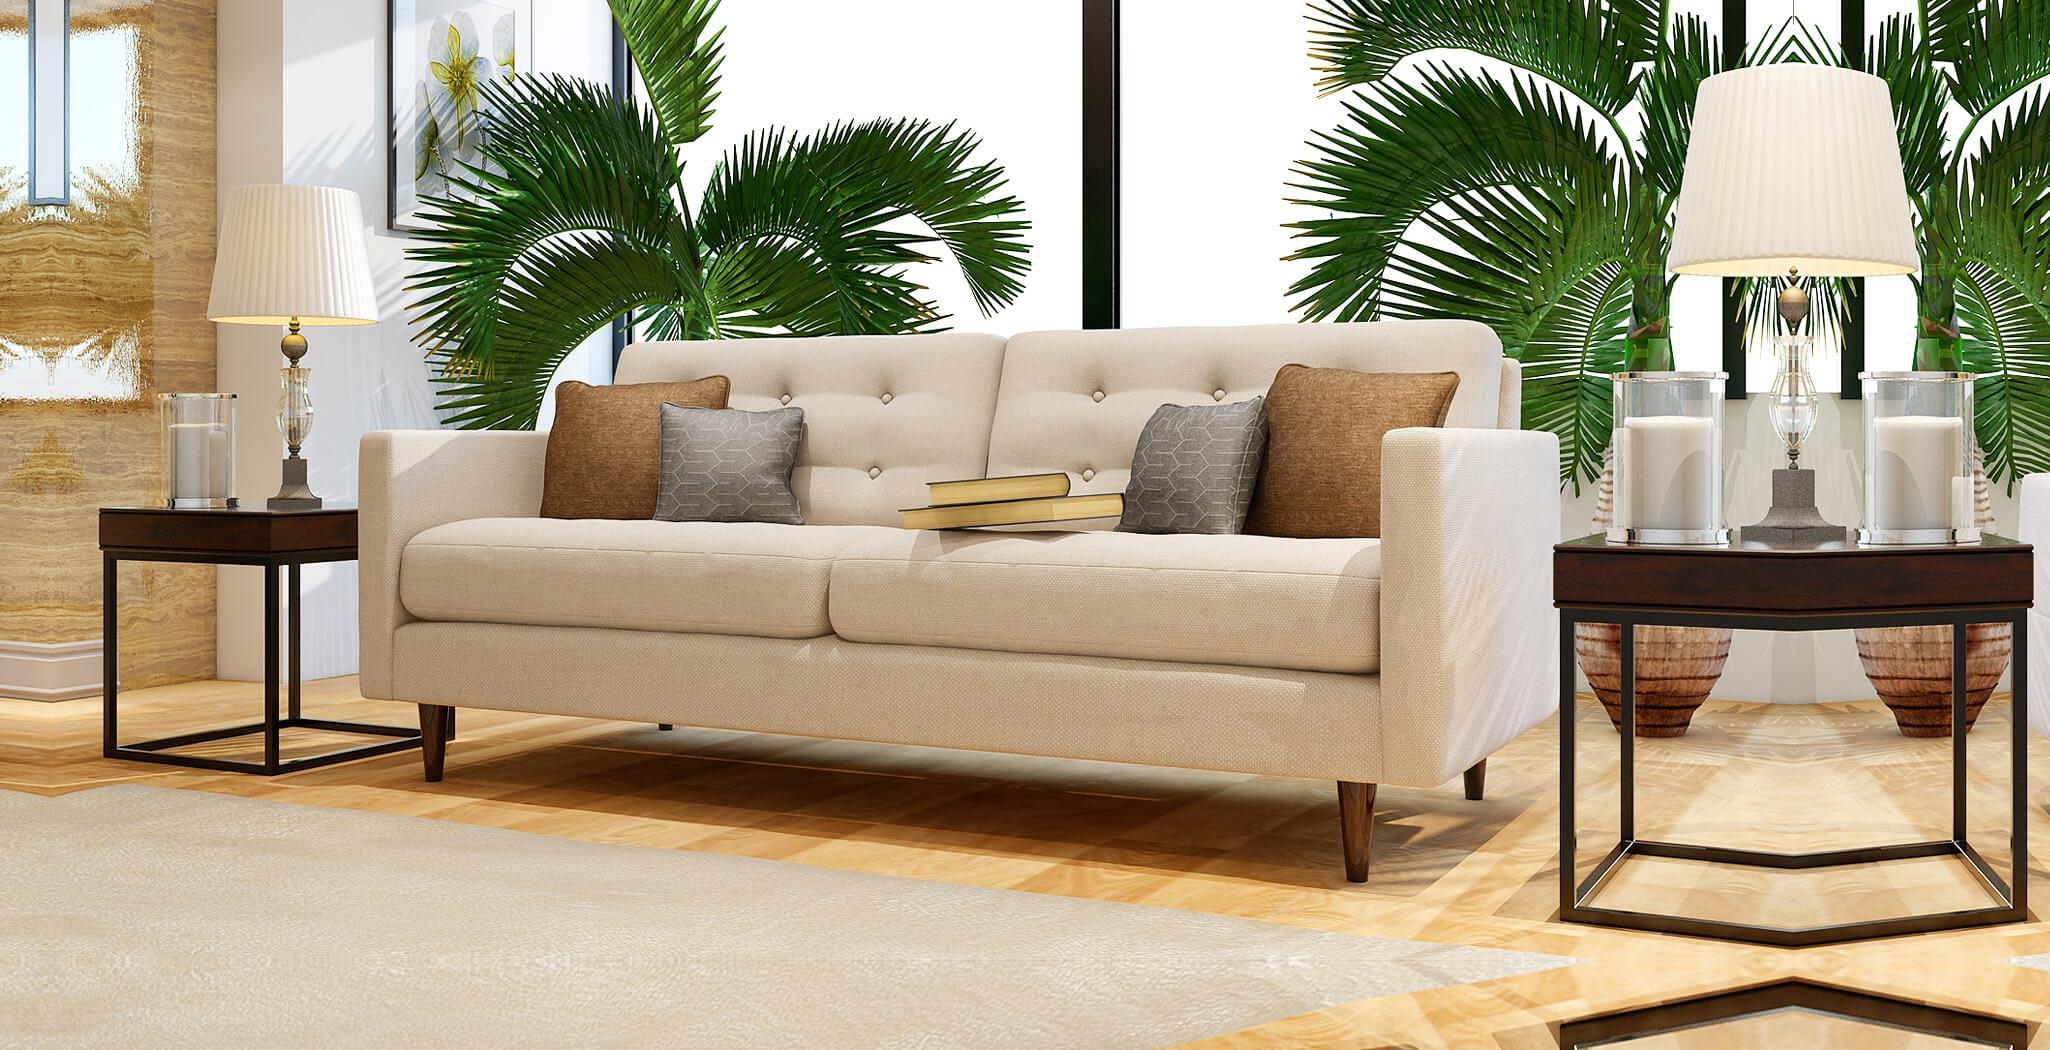 oslo sofa furniture gallery 1